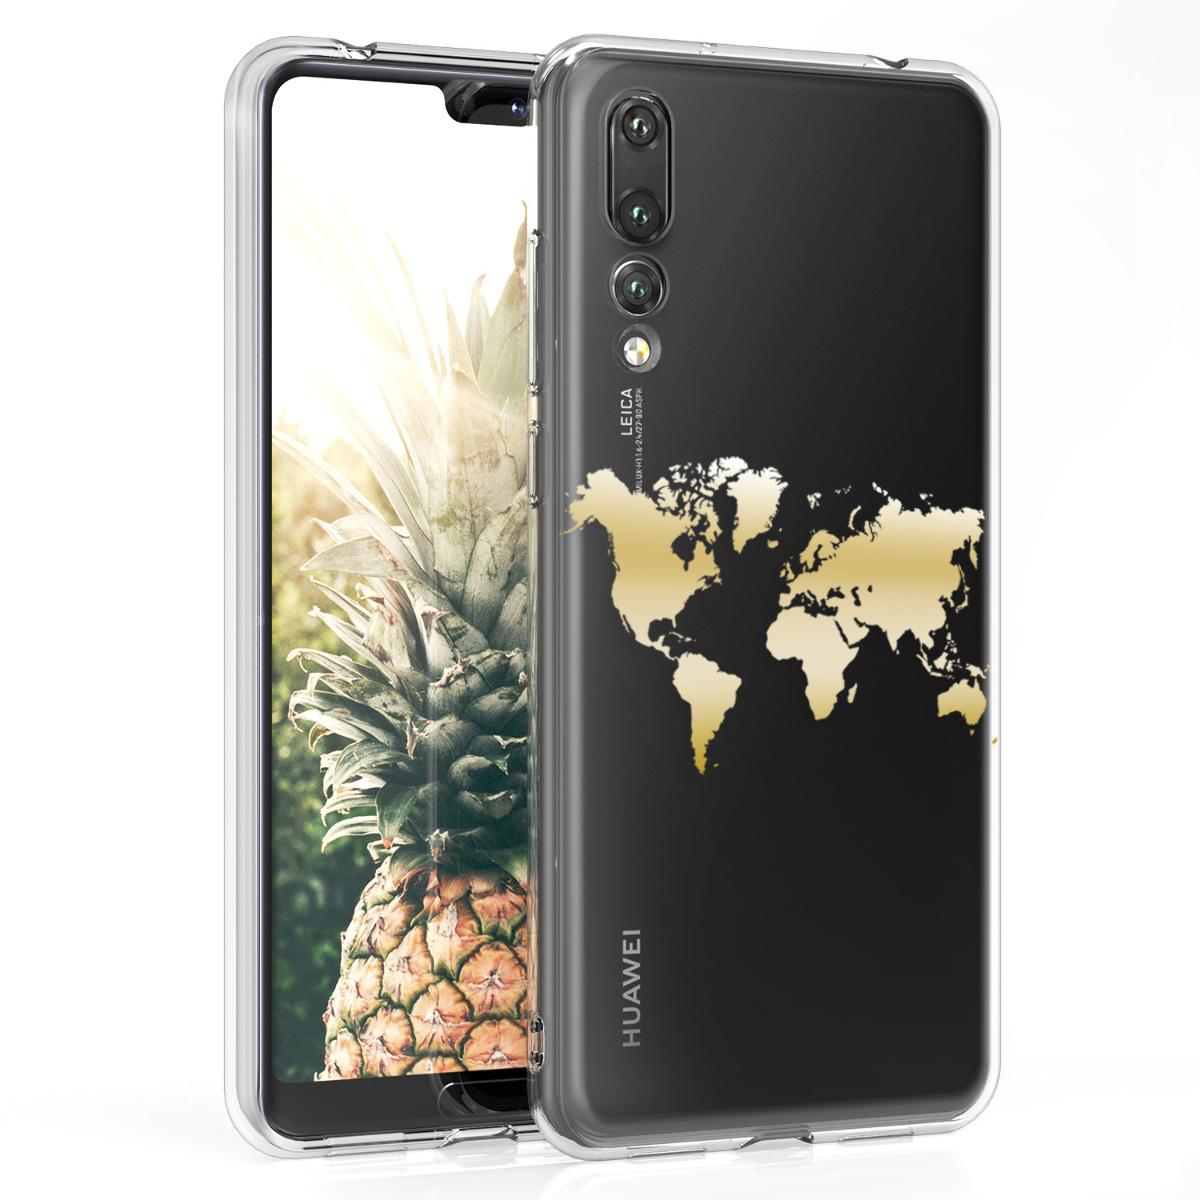 KW Θήκη Σιλικόνης Huawei P20 Pro - Gold / Transparent (44226.02)